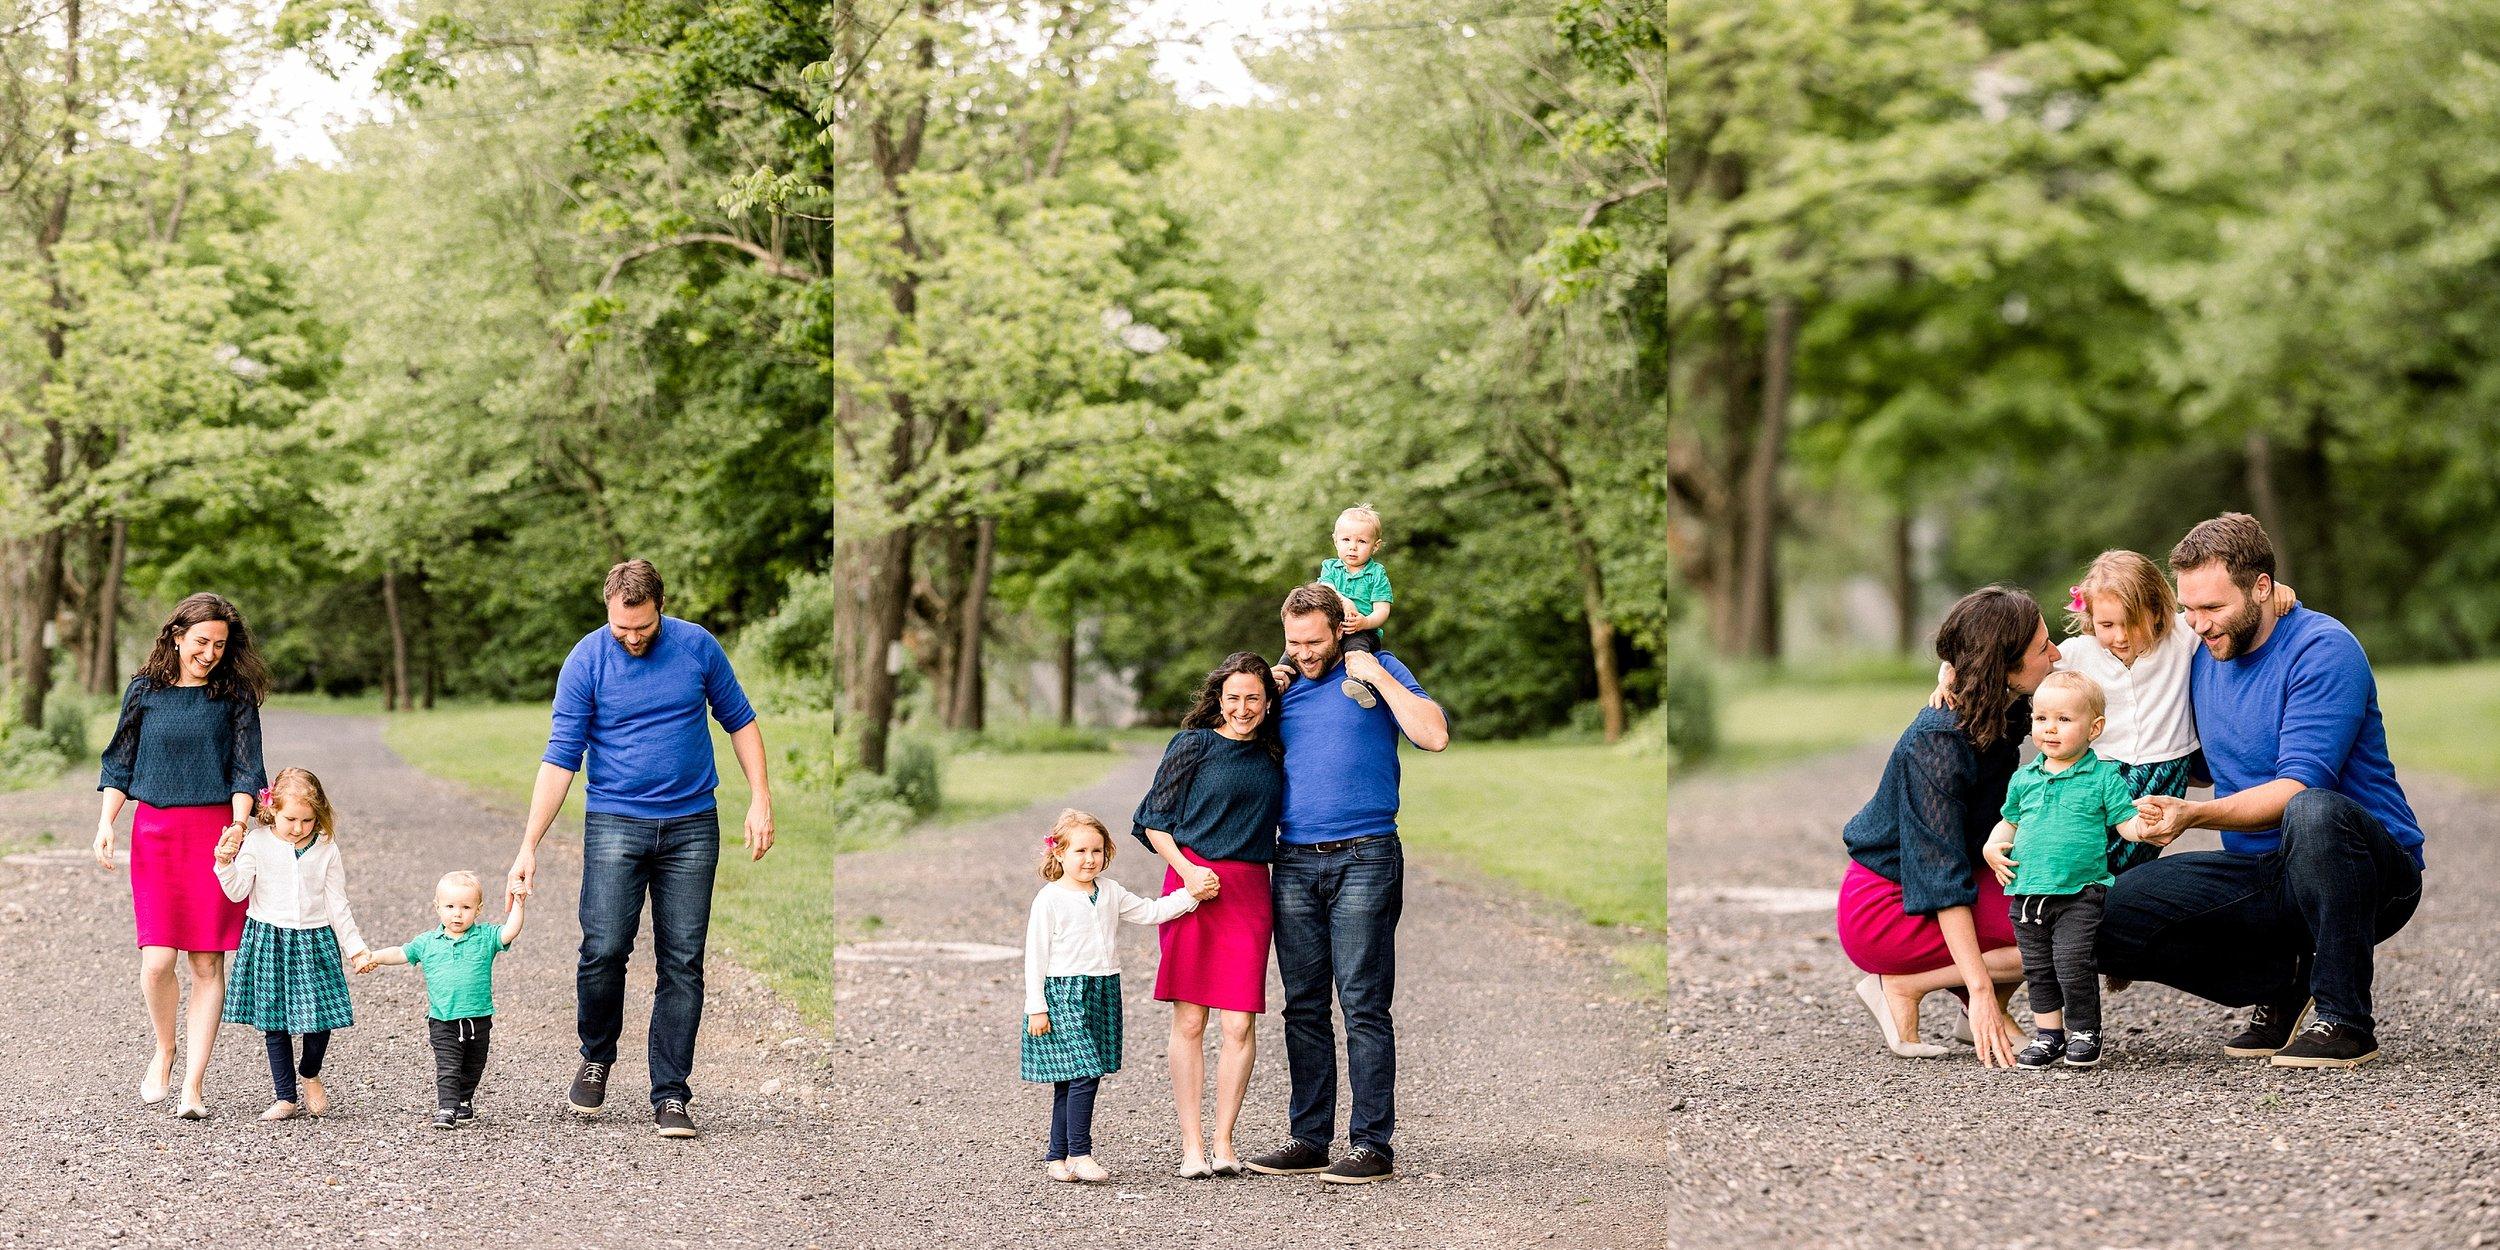 Lehigh-Valley-Family-Photographer_0018.jpg